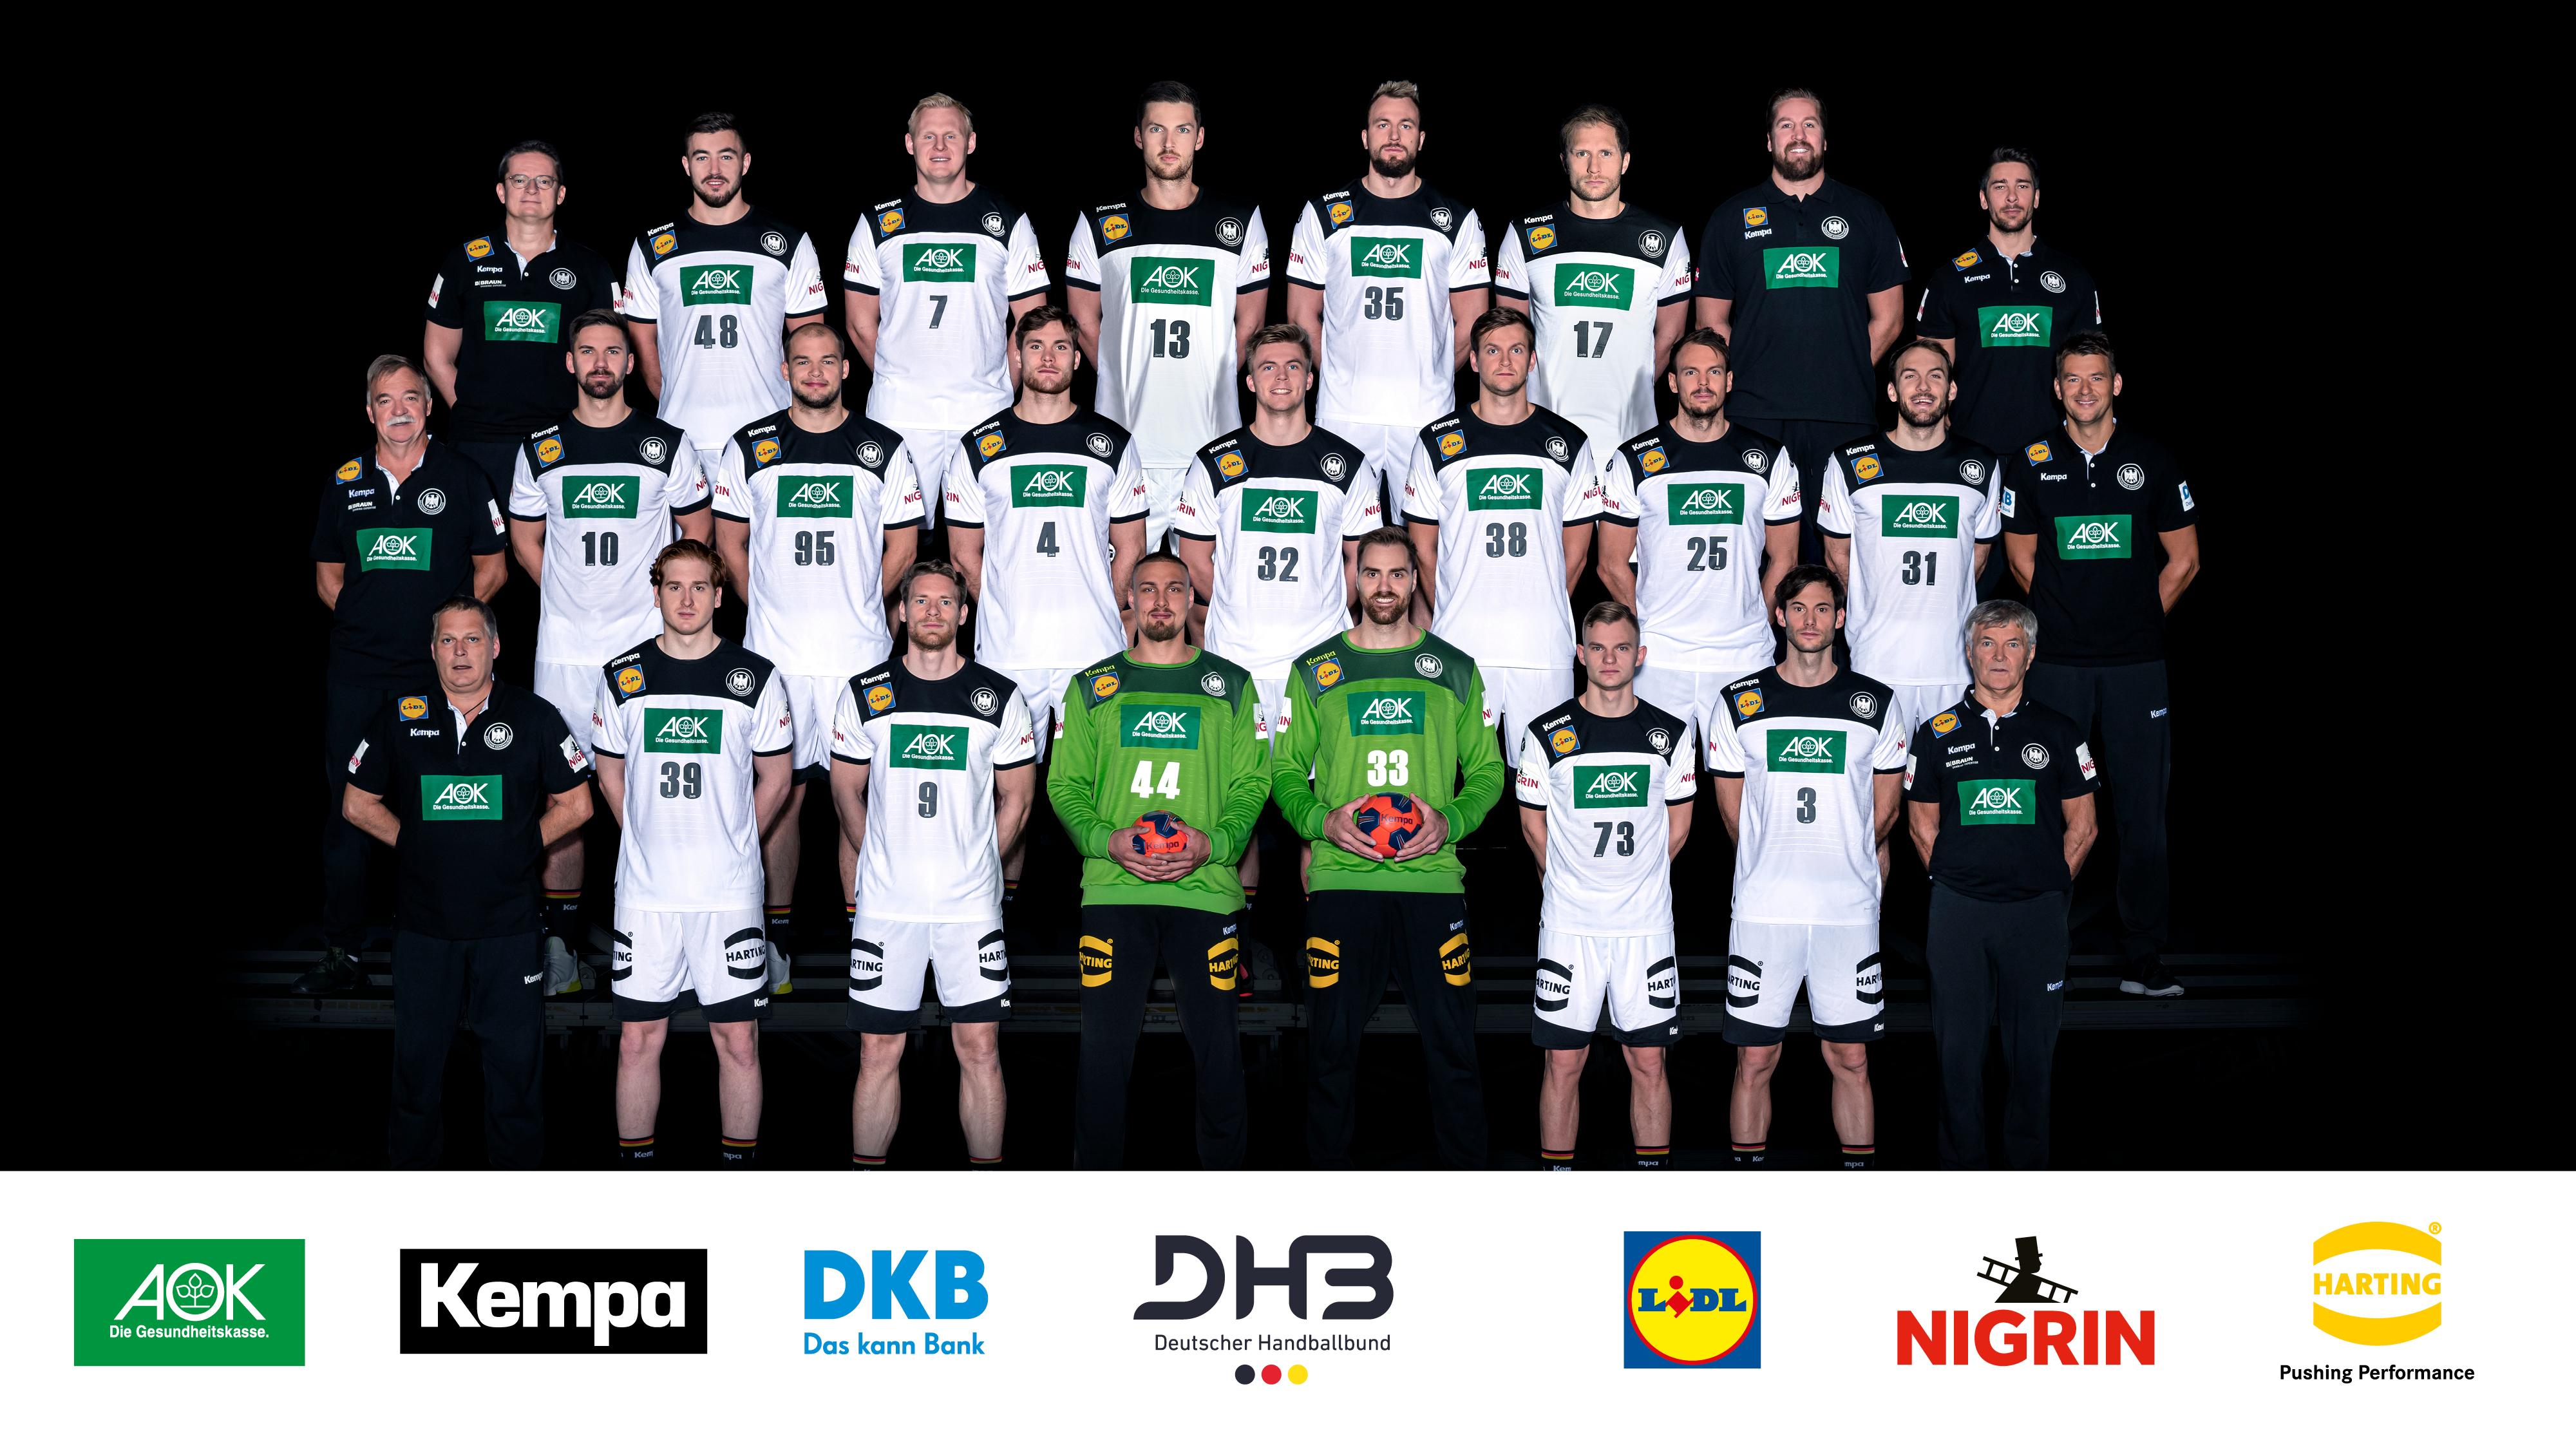 Handball Em 2020 Harting Technology Group